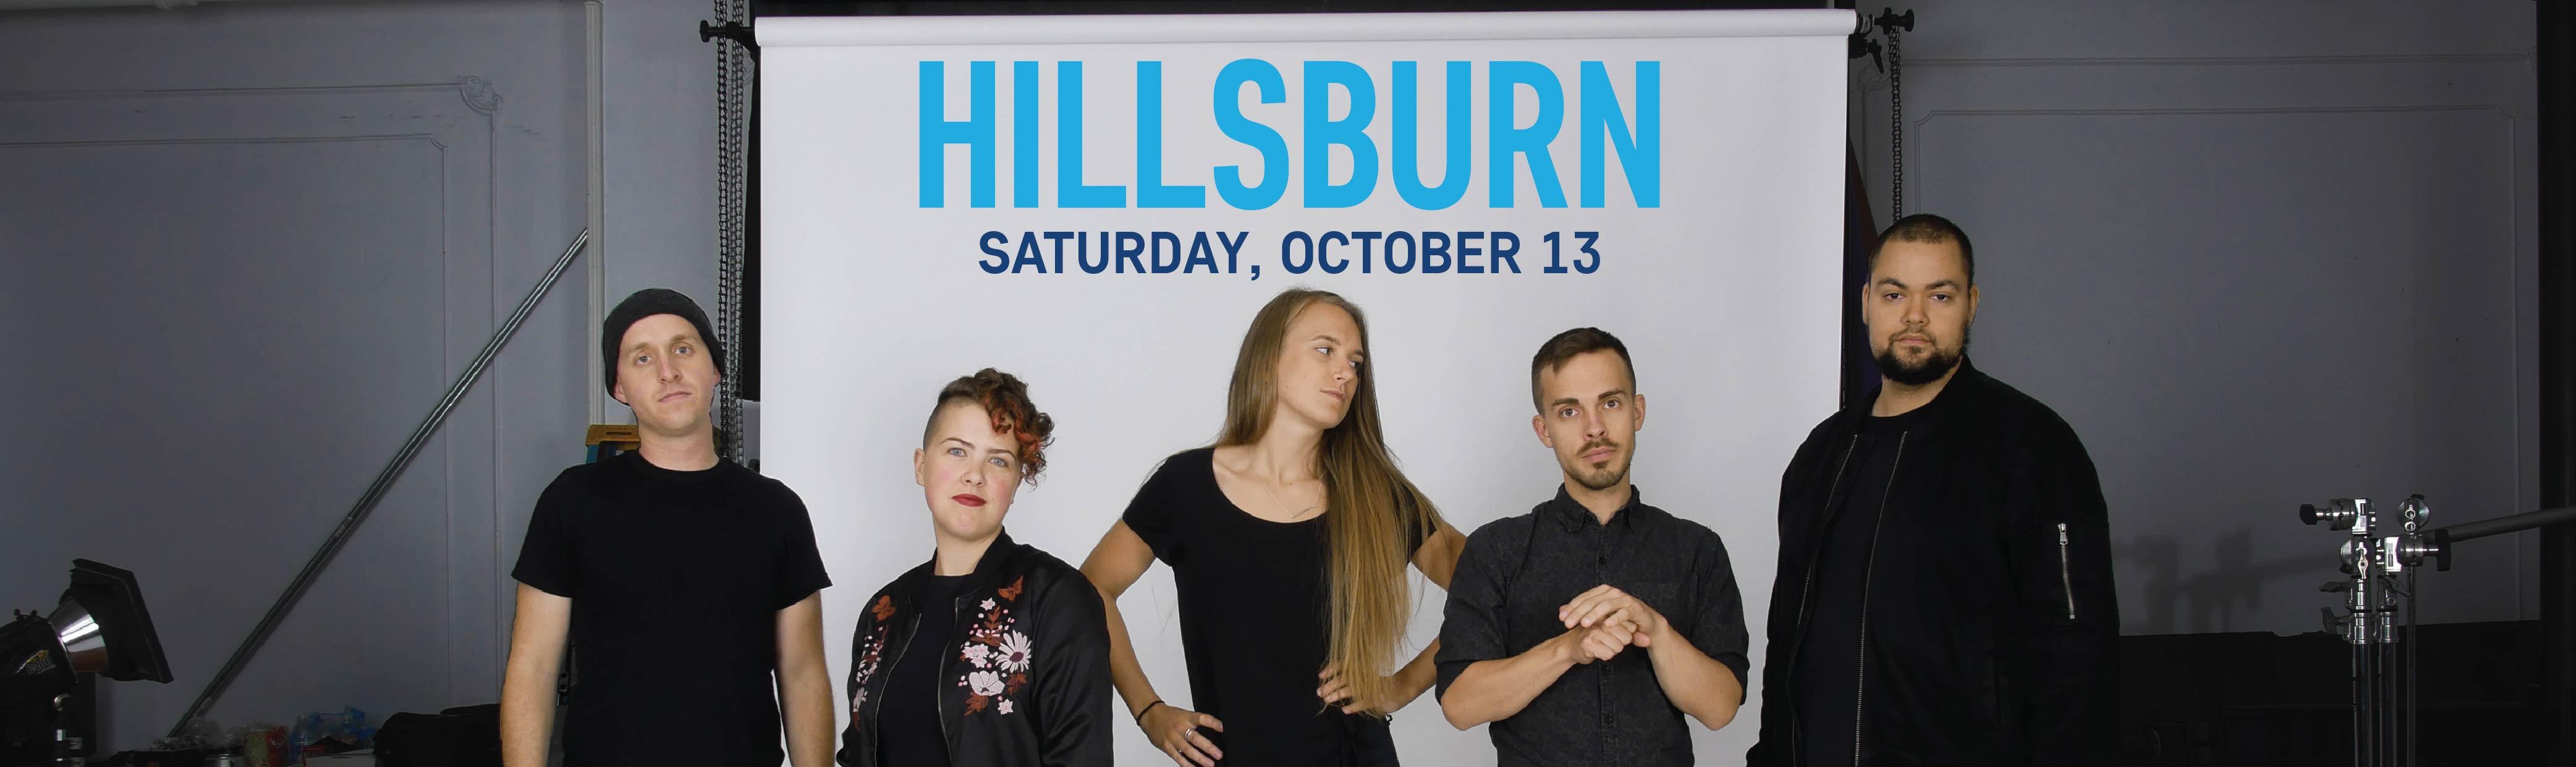 Fall Concert Series Digital Banners-11